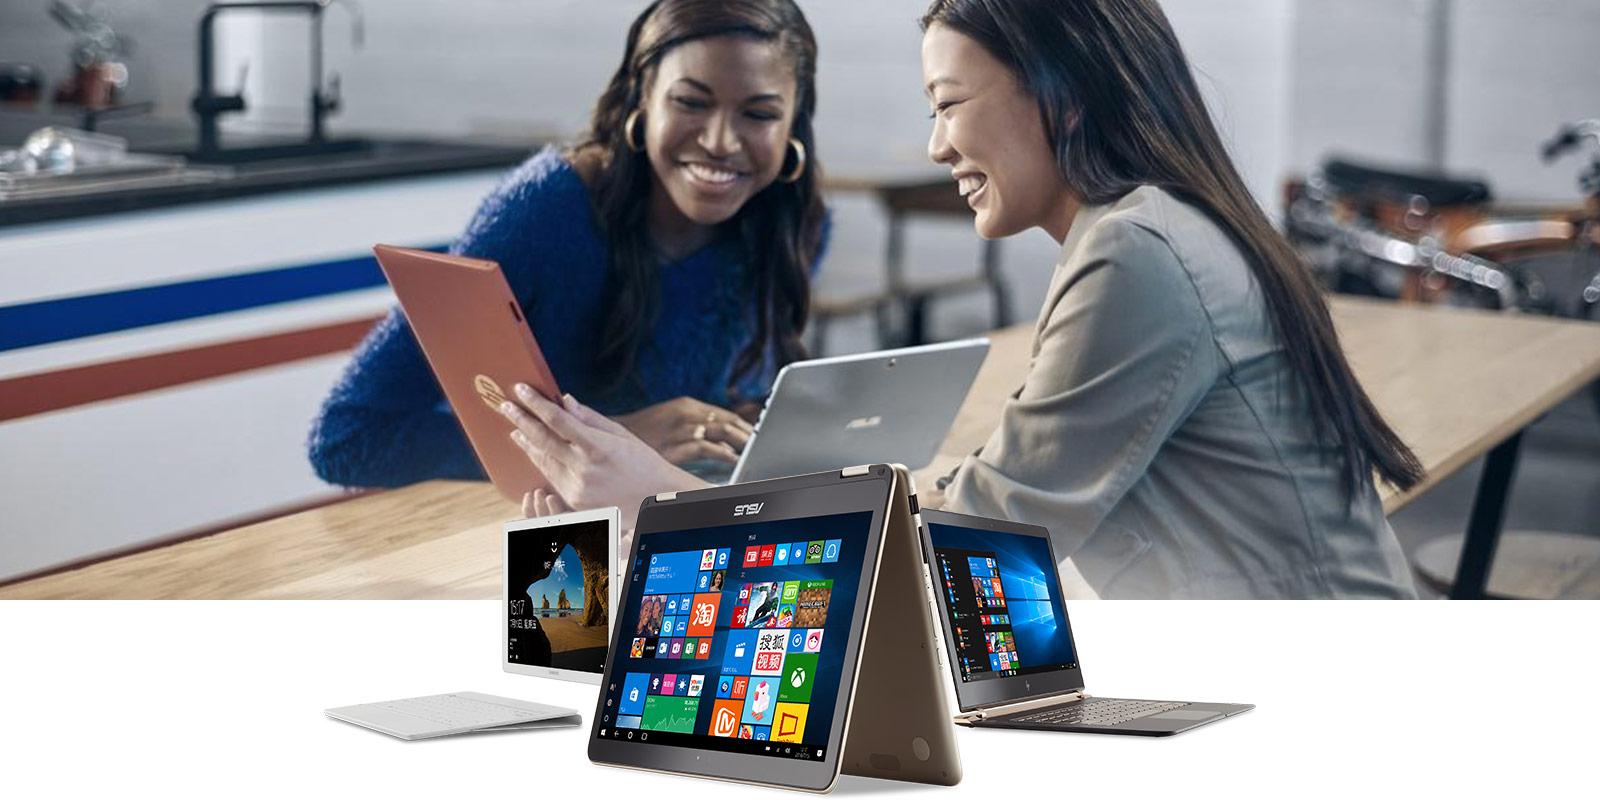 Windows 10 电脑和平板电脑